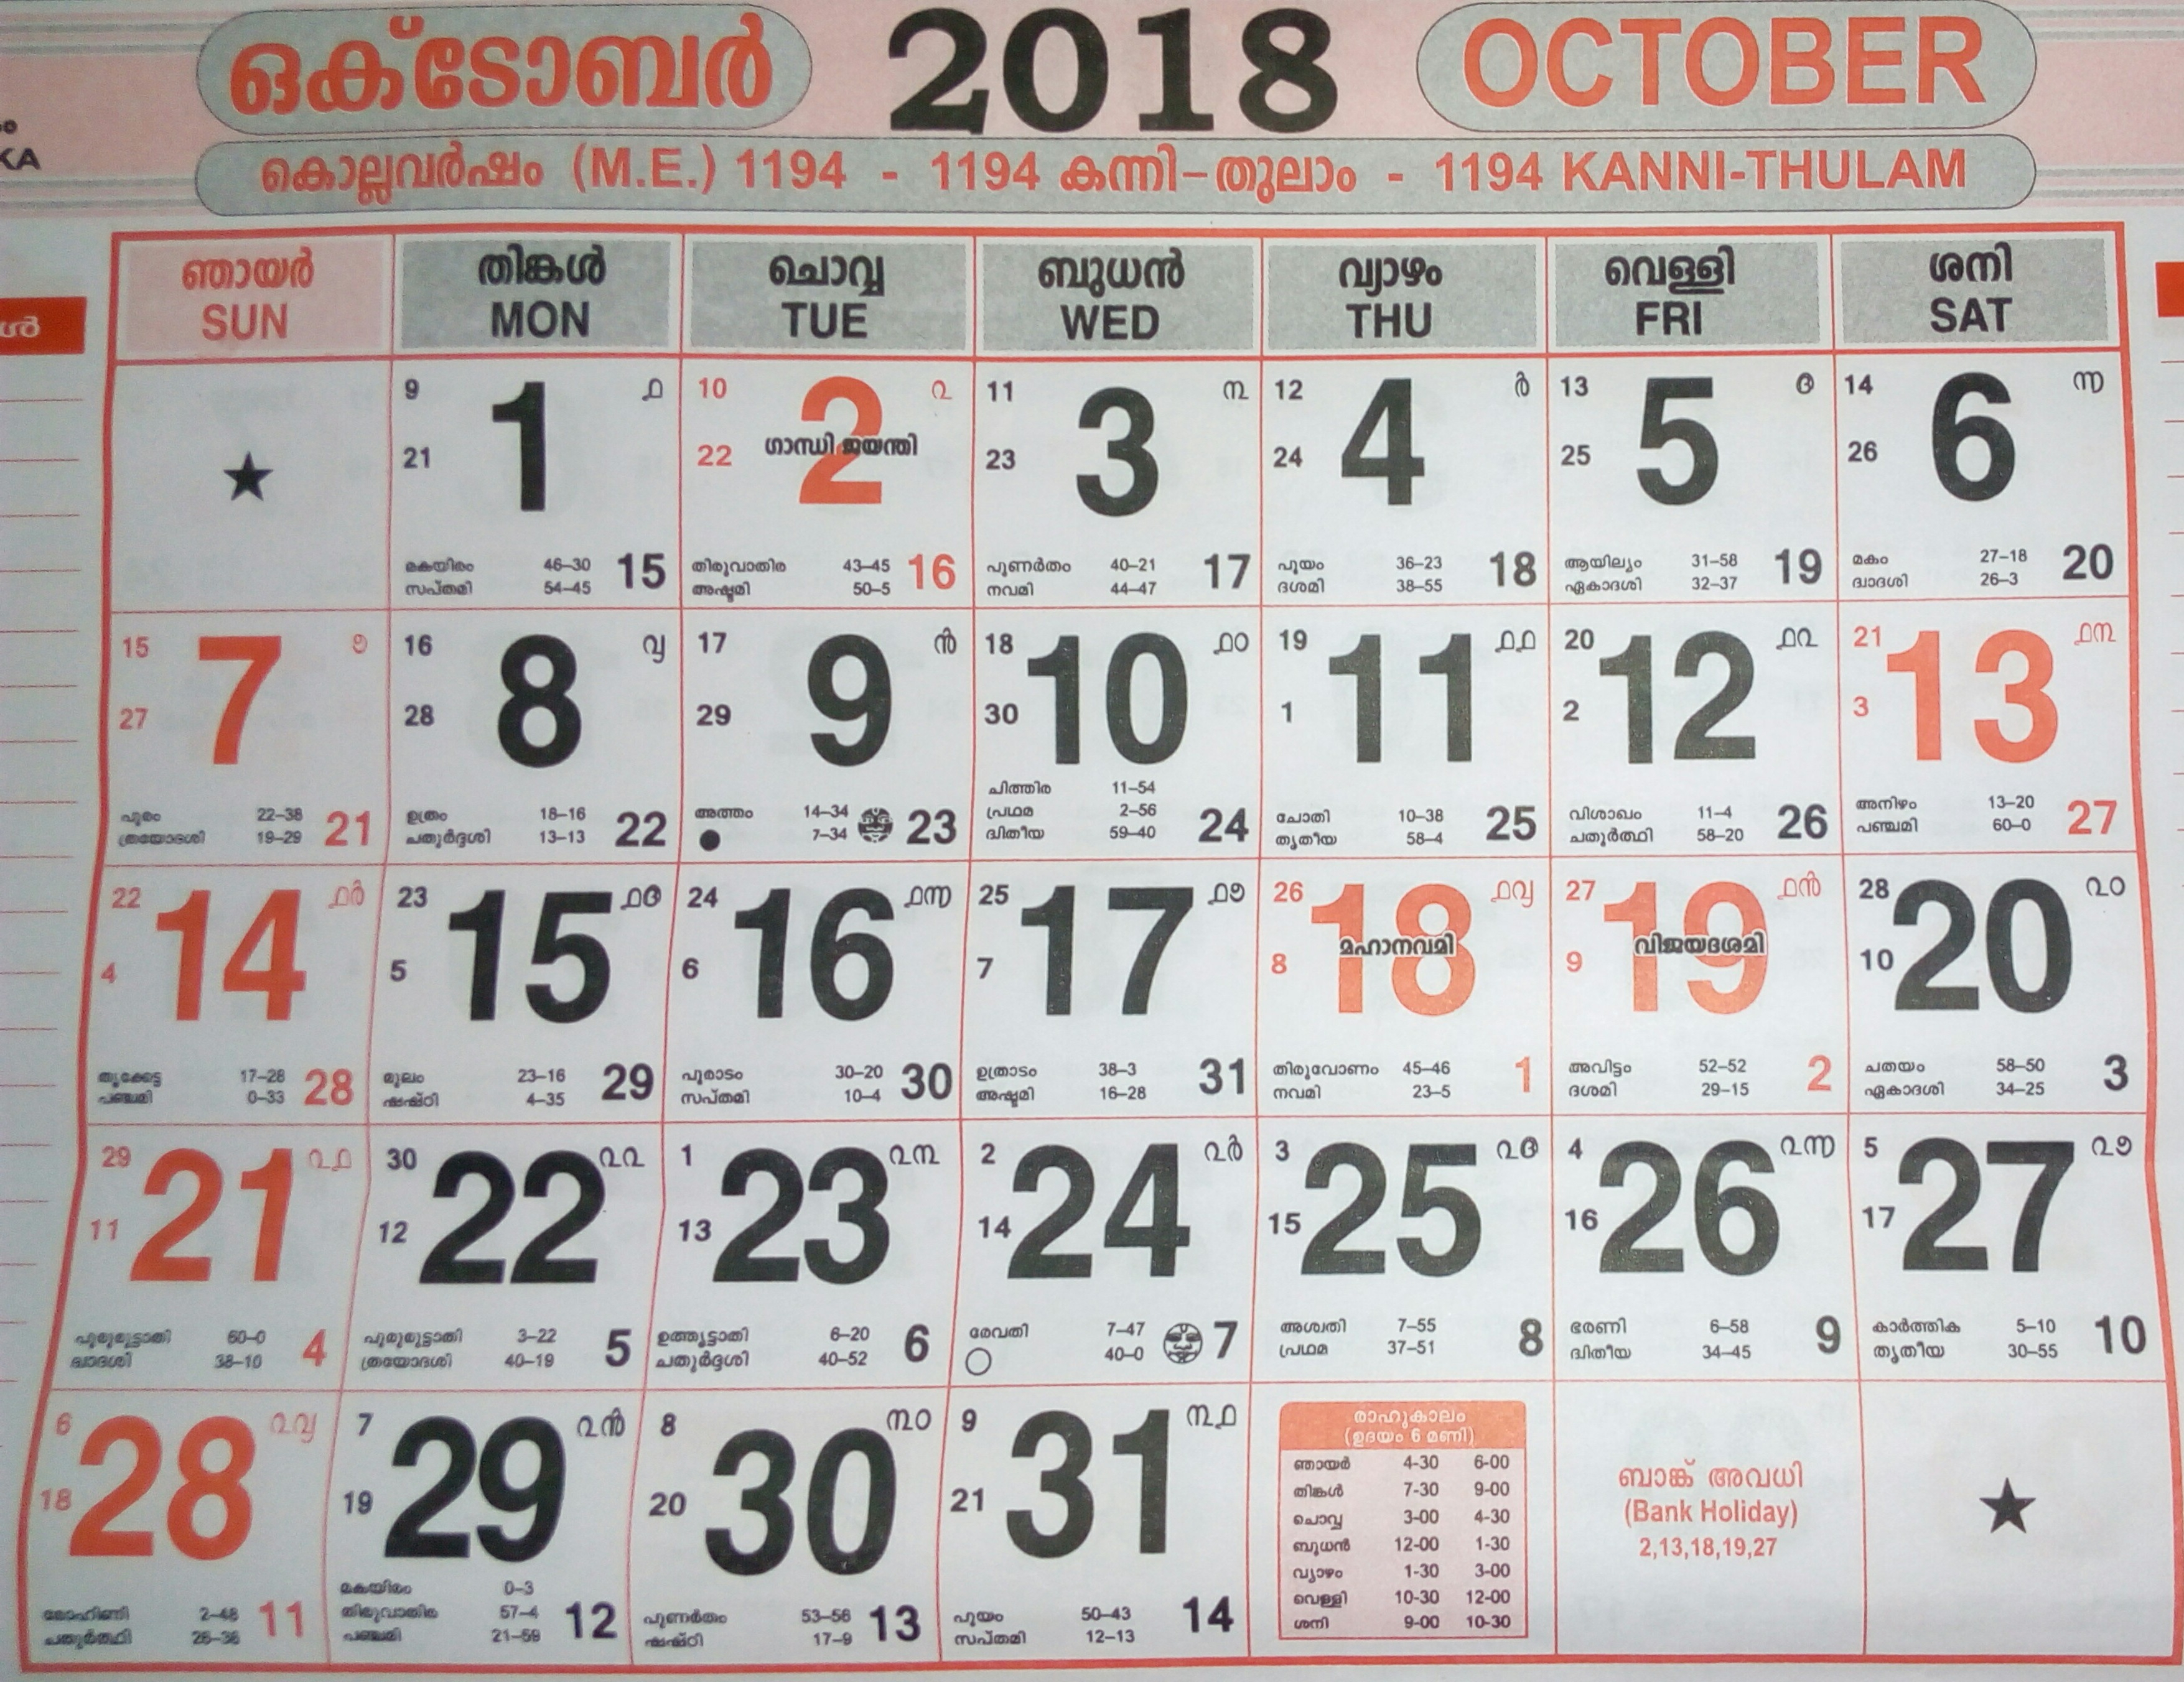 October 2018 Calendar Malayalam in Malayalam Calendar 2018 September